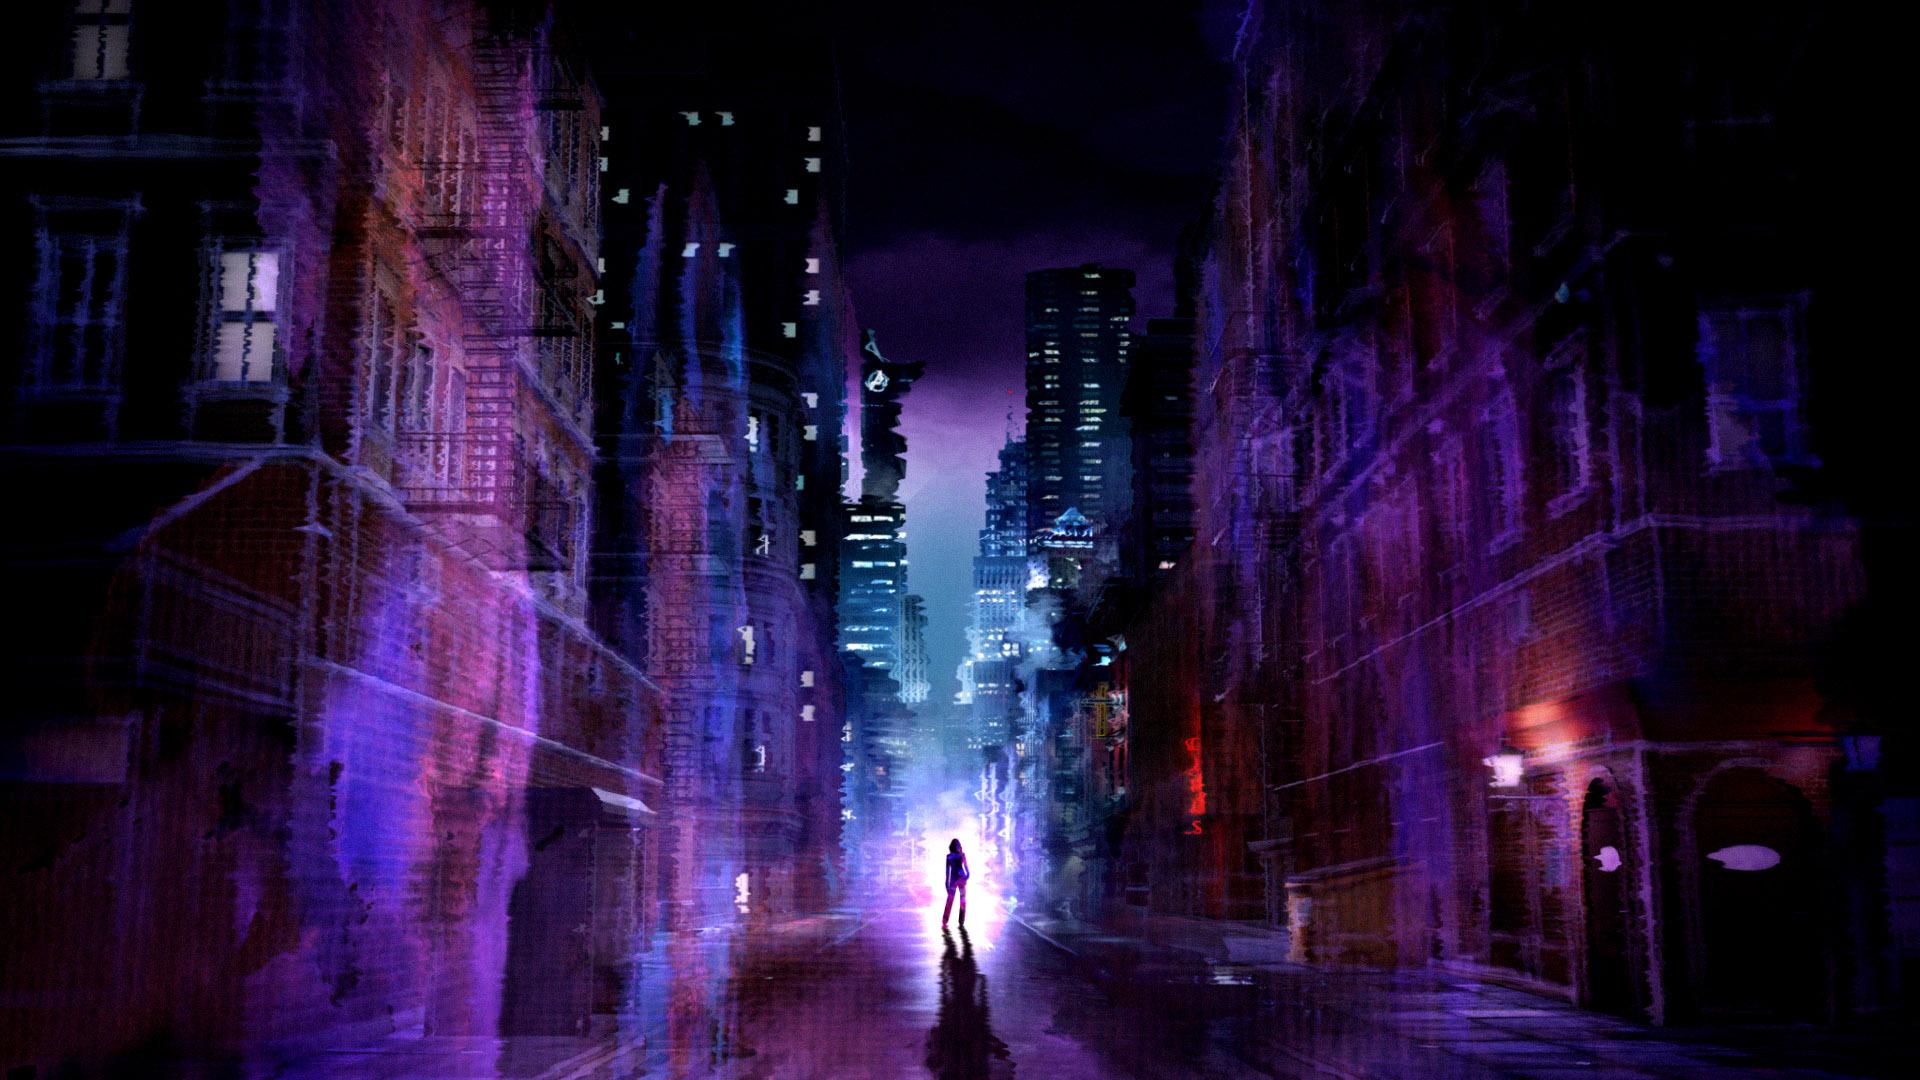 AKA_Teaser_Dreams_Texted_PreLaunch_Stereo_ProResHQ (00794)_web.jpg